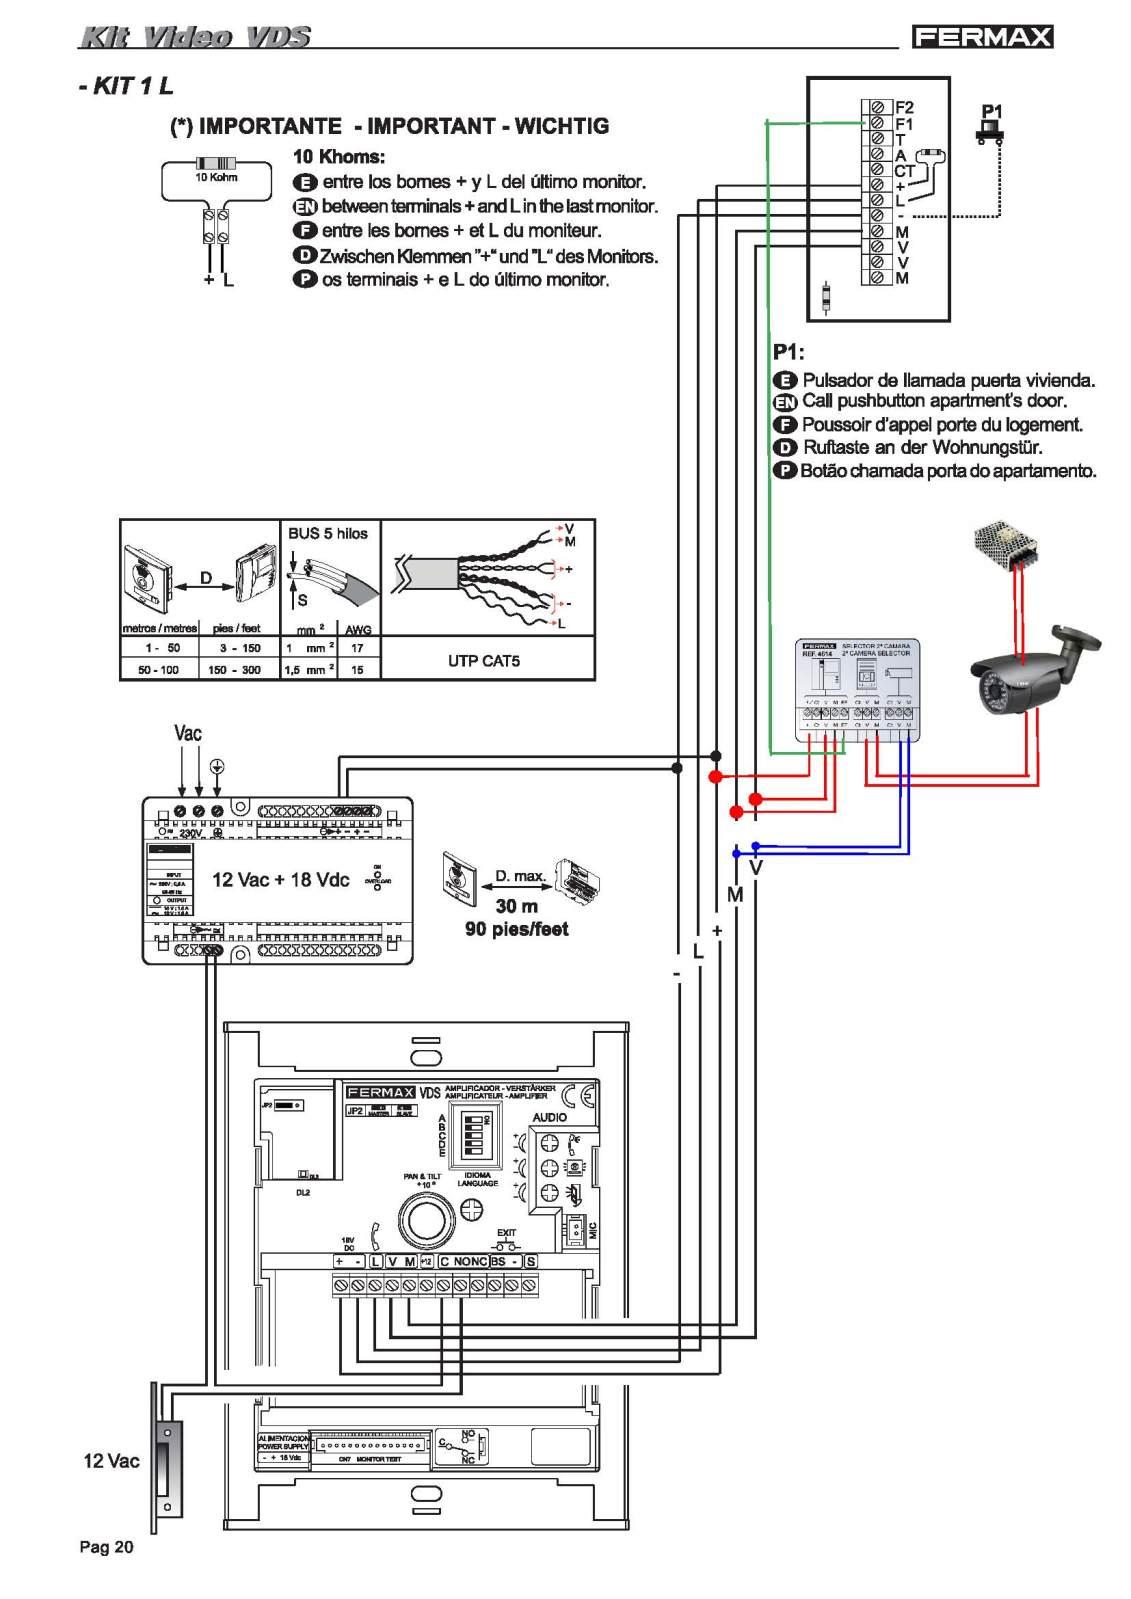 C mo conectar videoportero con cable utp blog de for Telefonillo fermax esquema